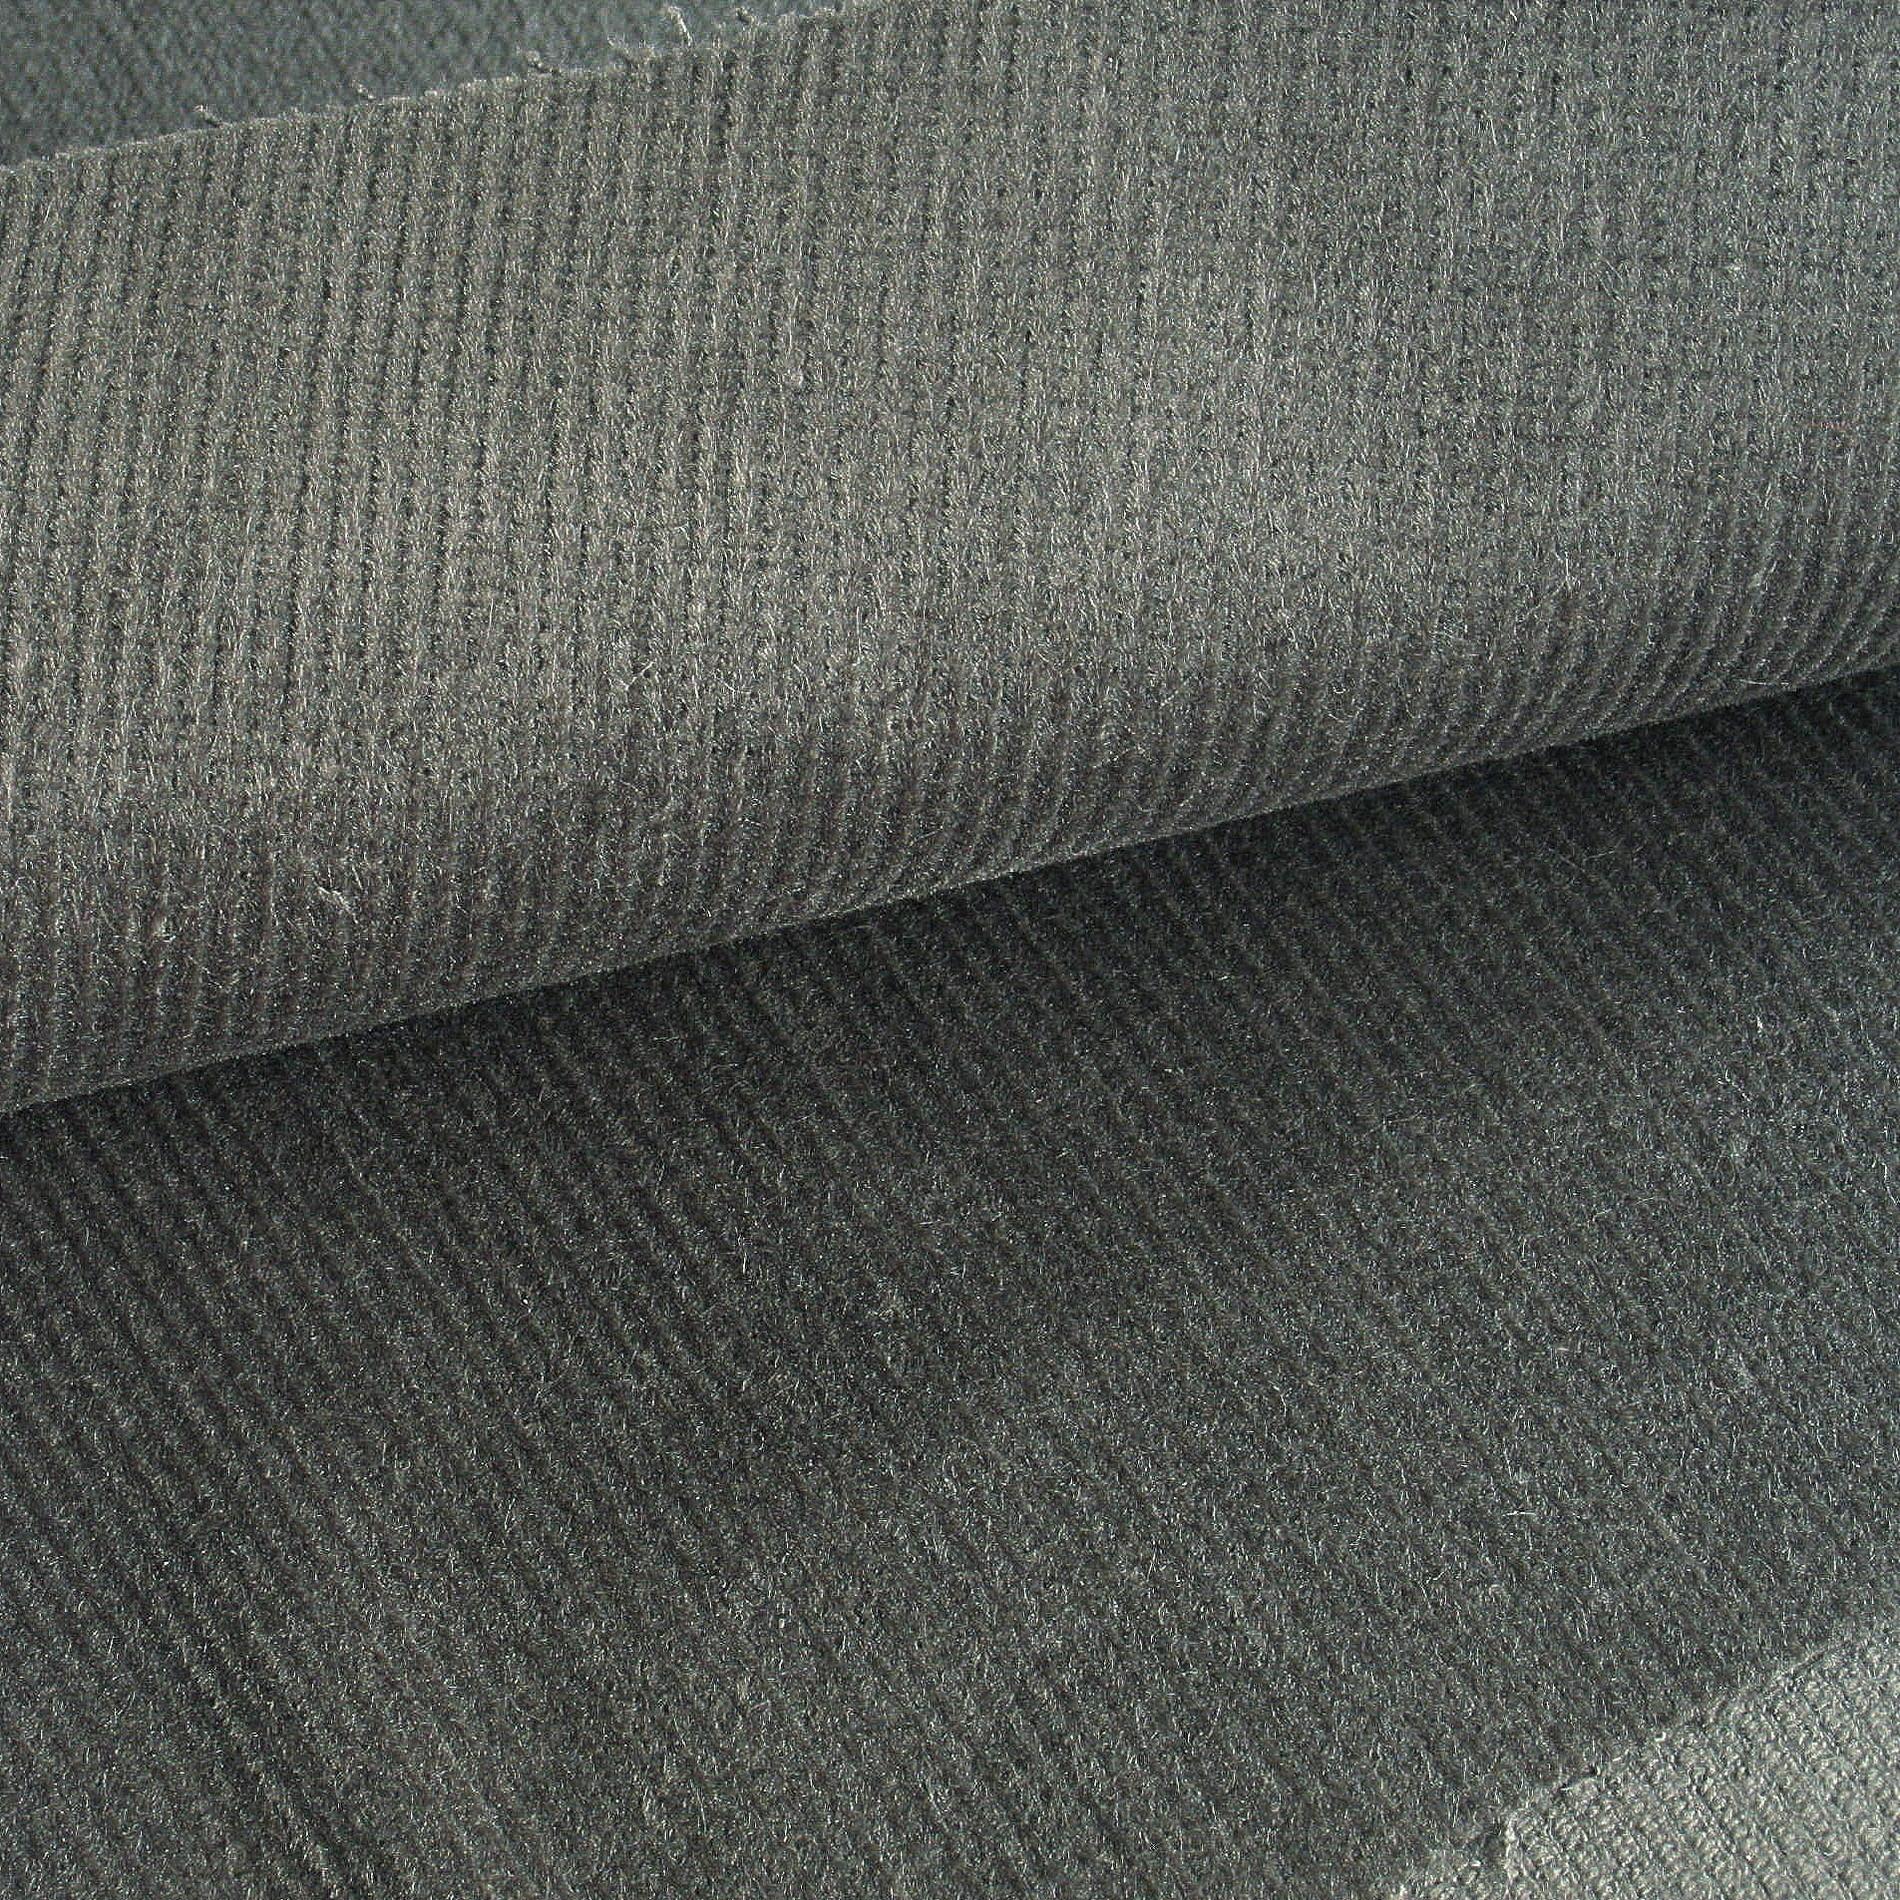 feincord in grau uni stoffe graue stoffe. Black Bedroom Furniture Sets. Home Design Ideas